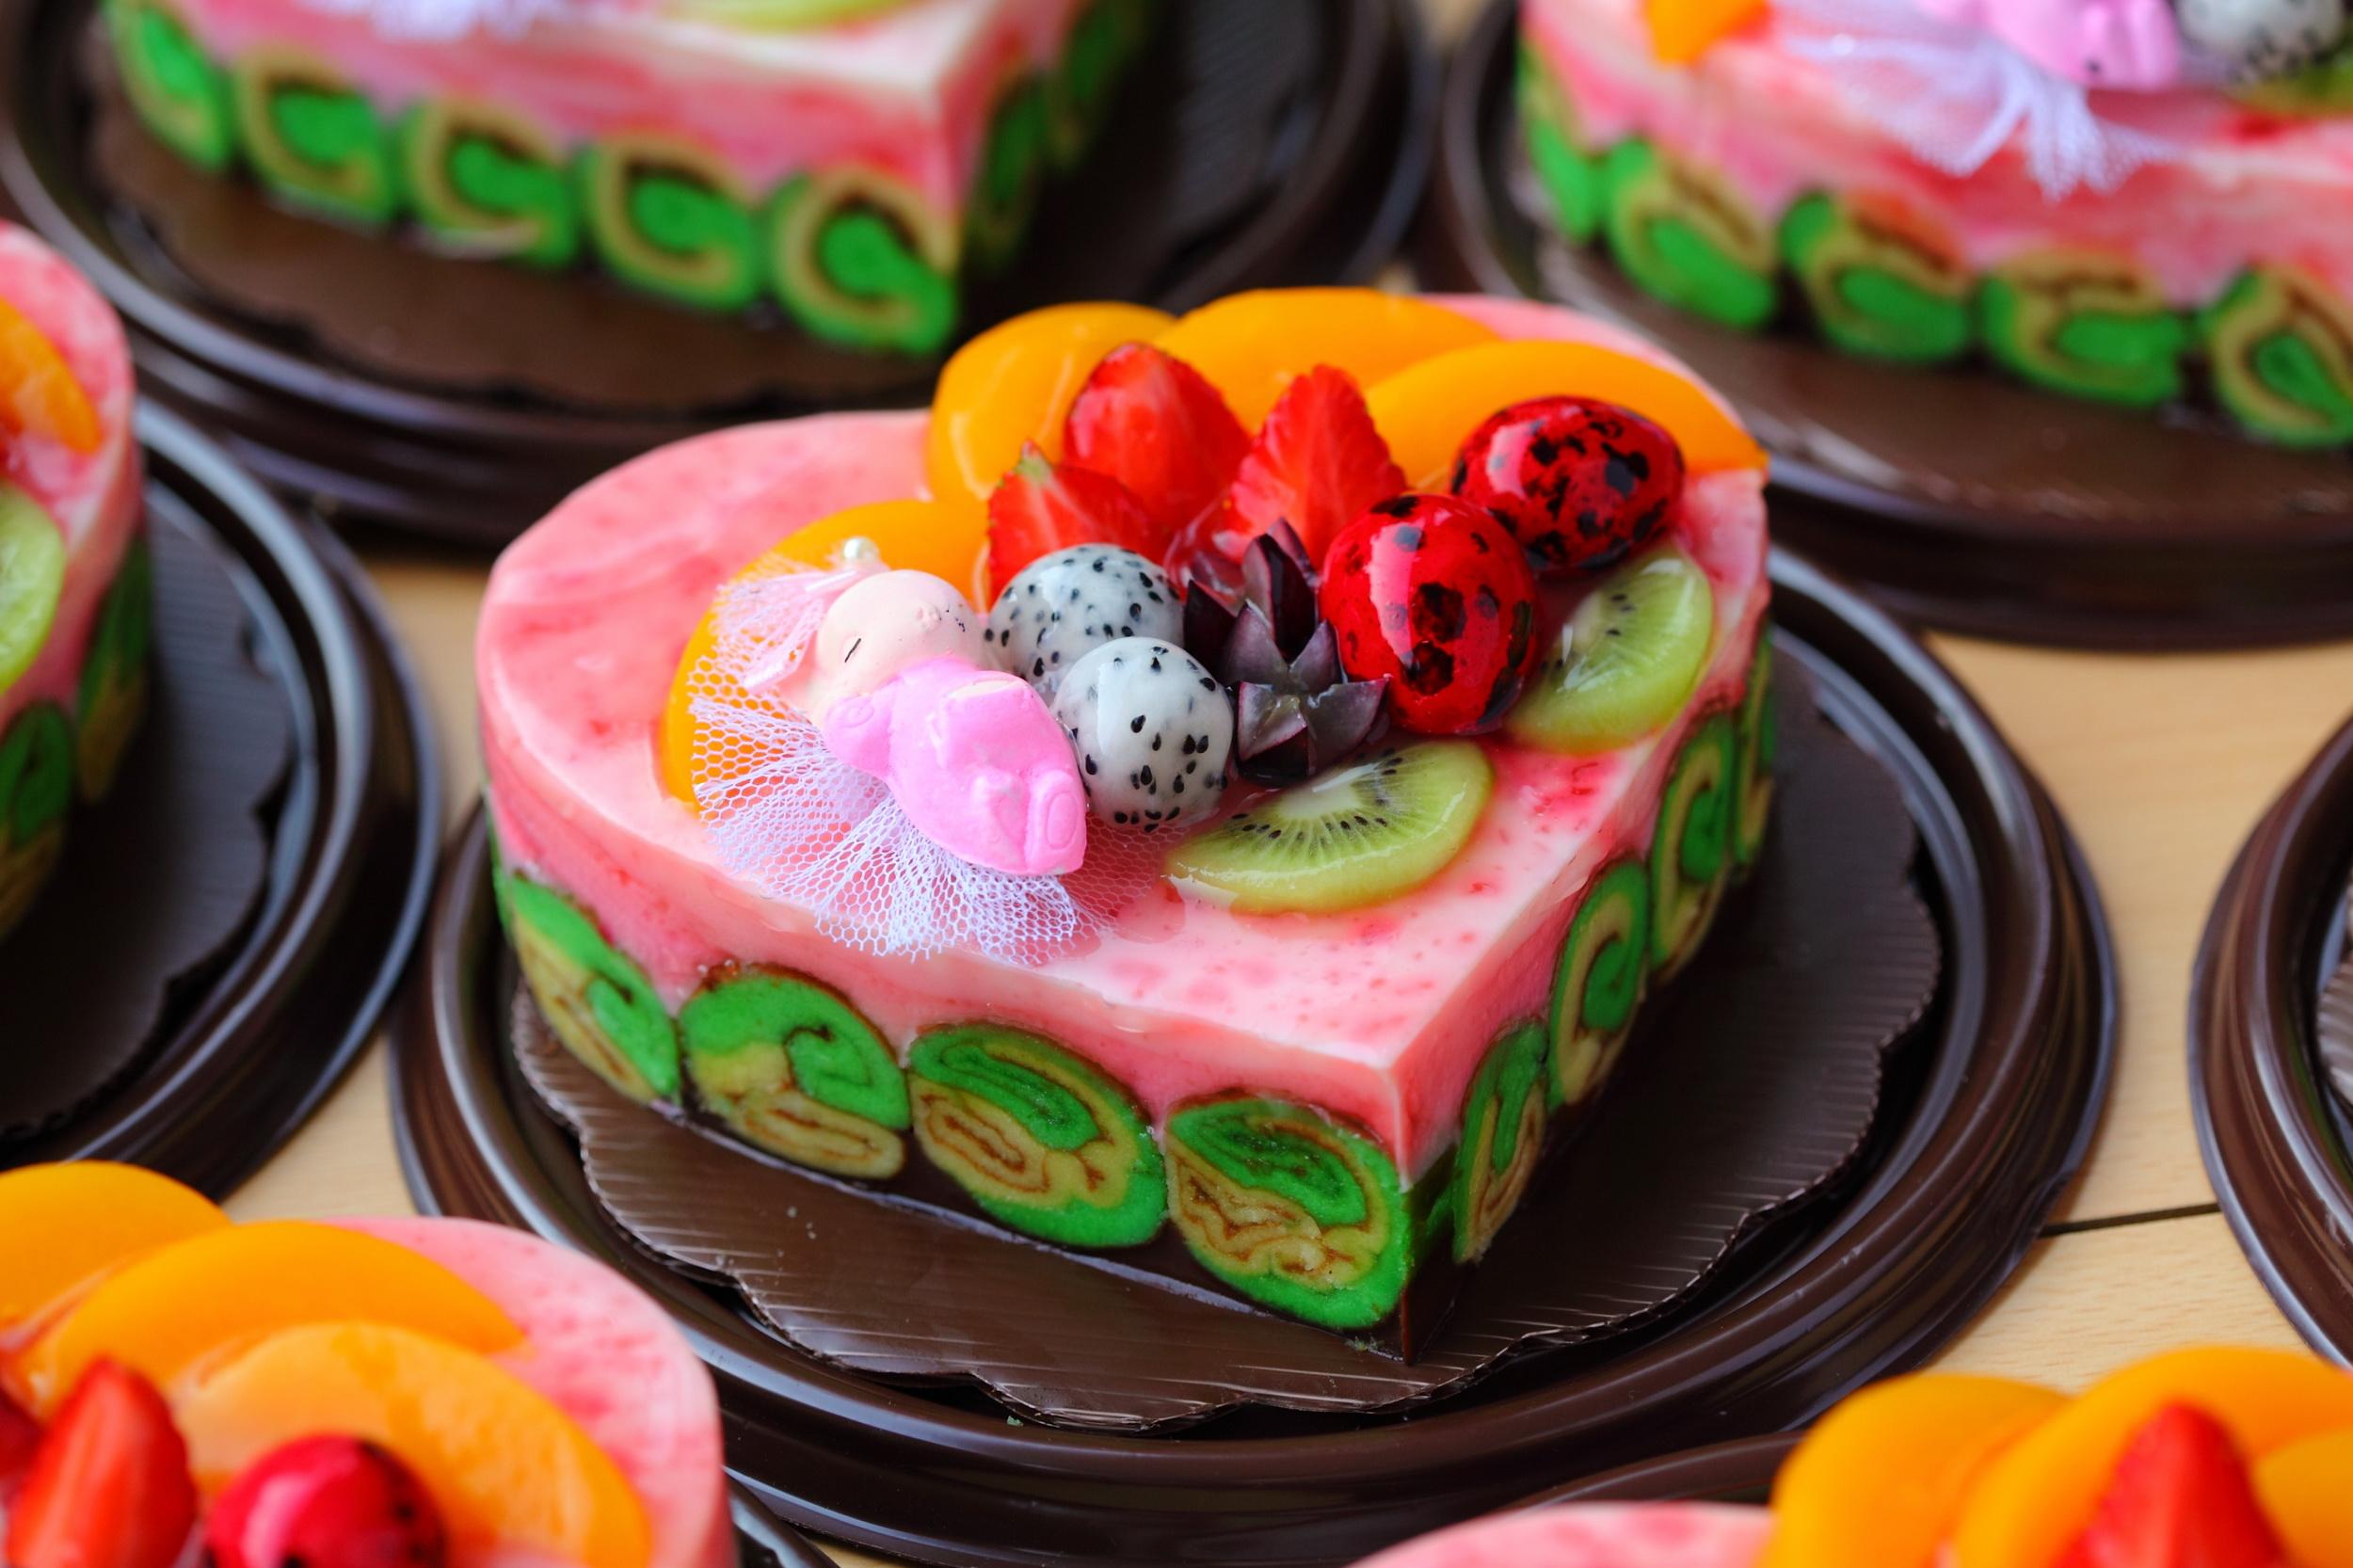 Strawberry Choco Manyee 16cm Hati